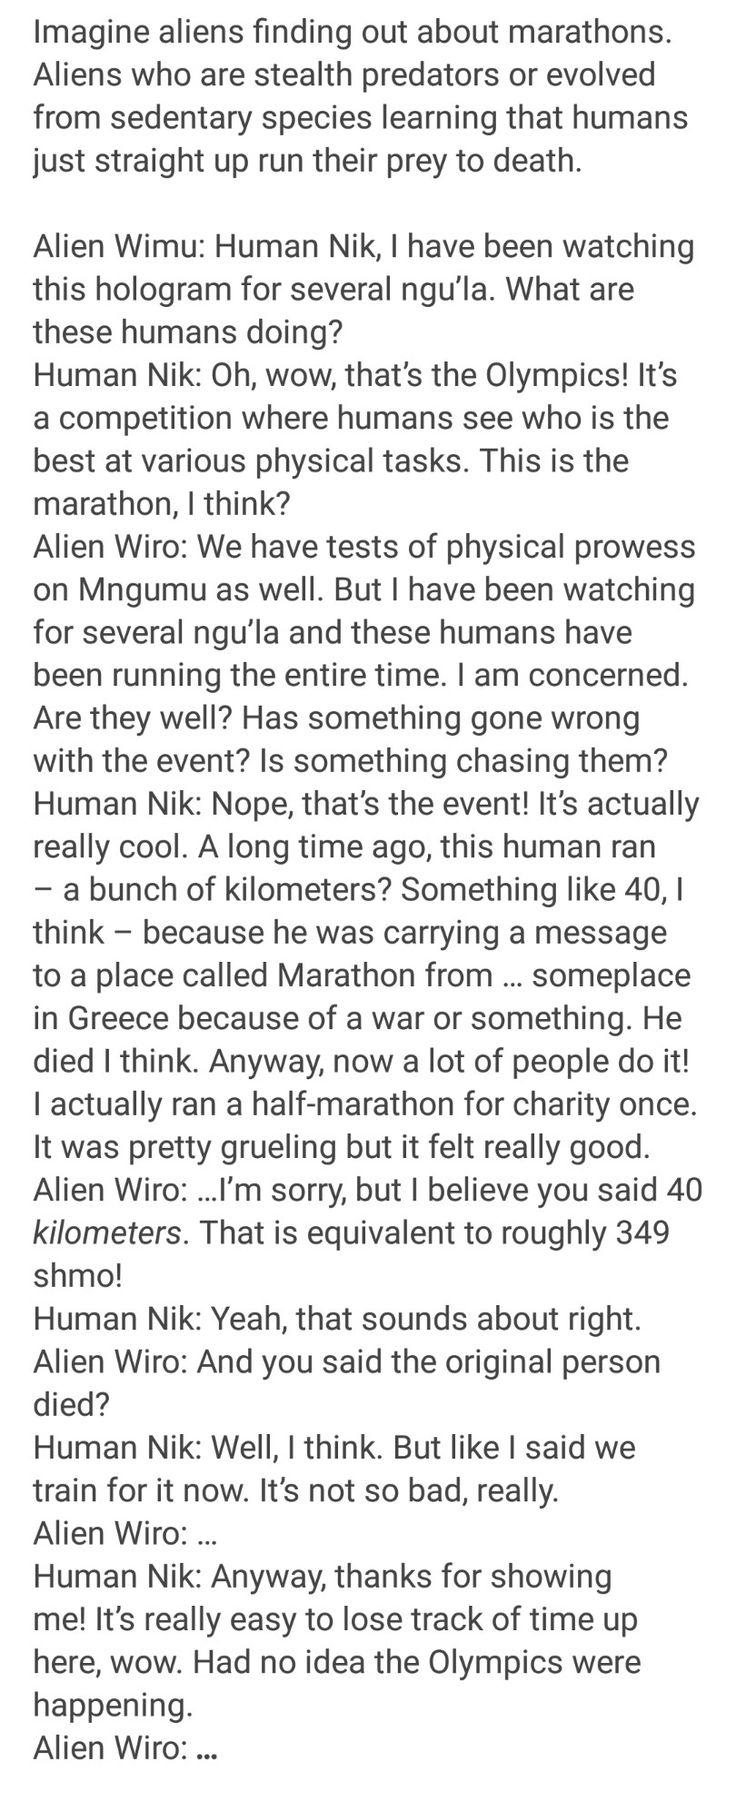 Humans are weird: Marathons